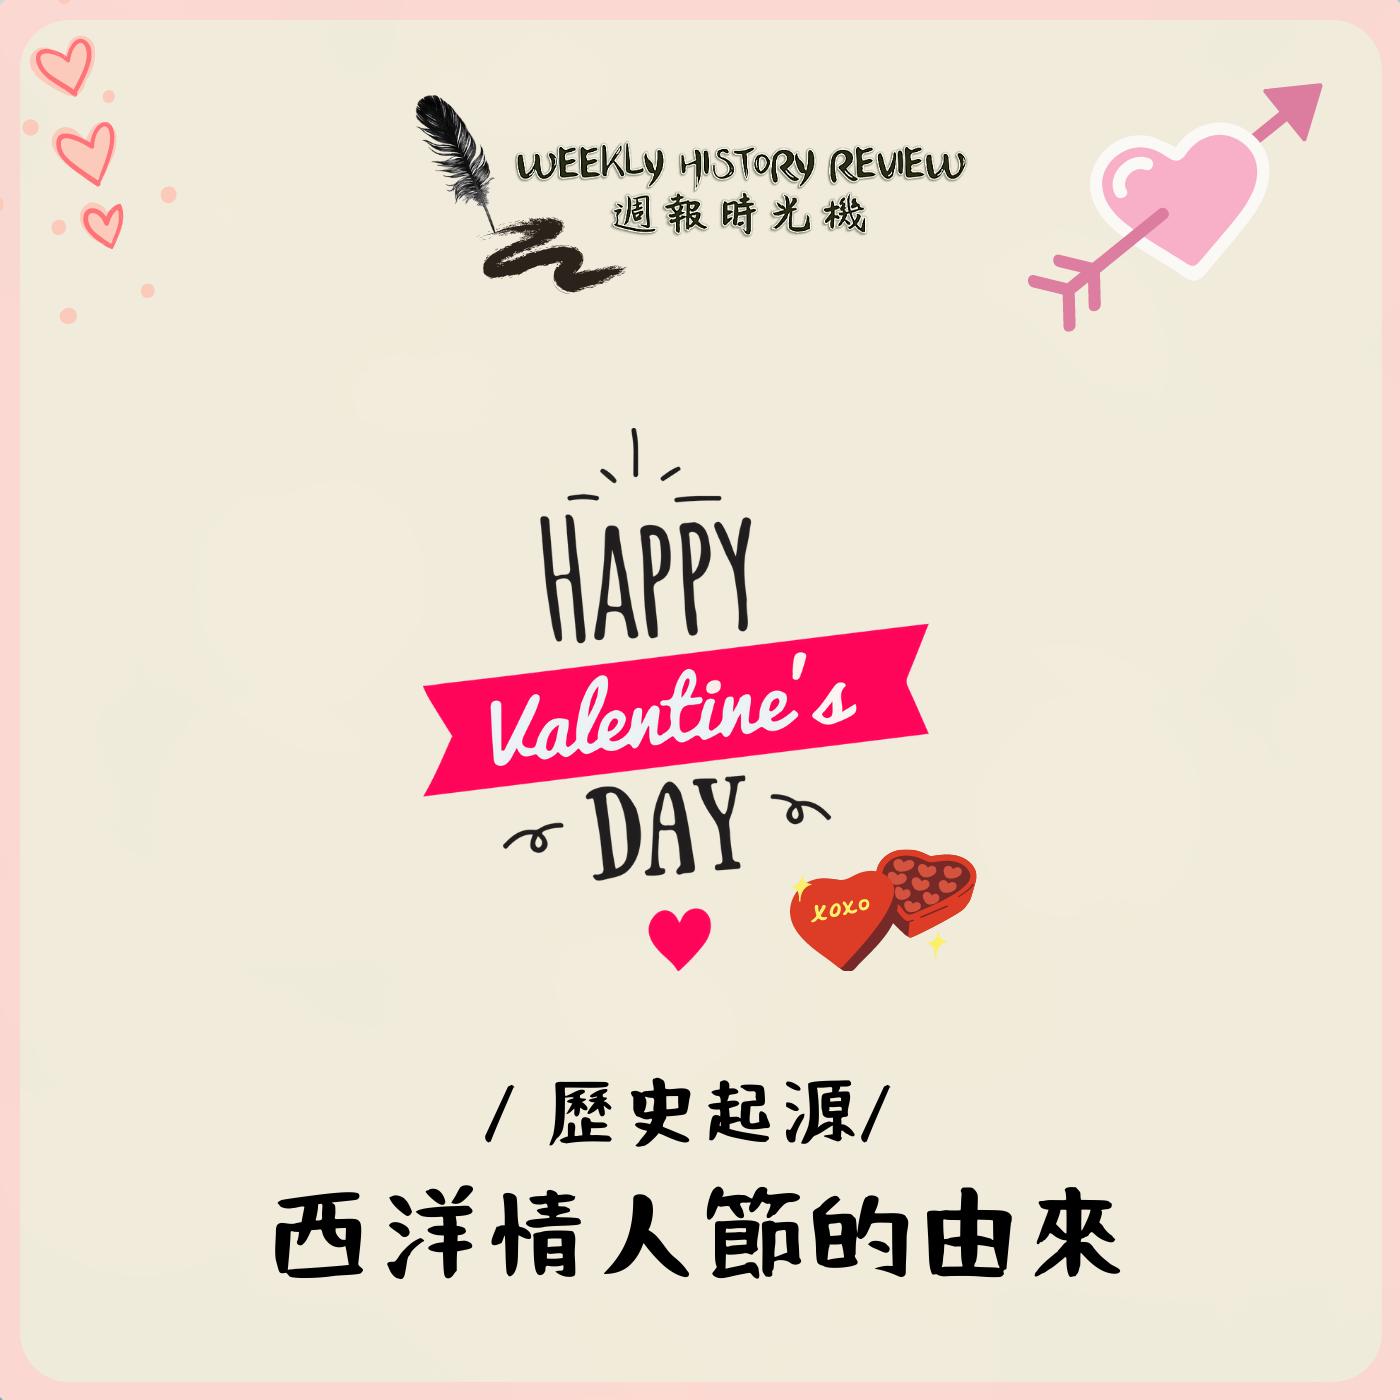 歷史起源 / 西洋情人節的由來【Happy Valentine's Day】